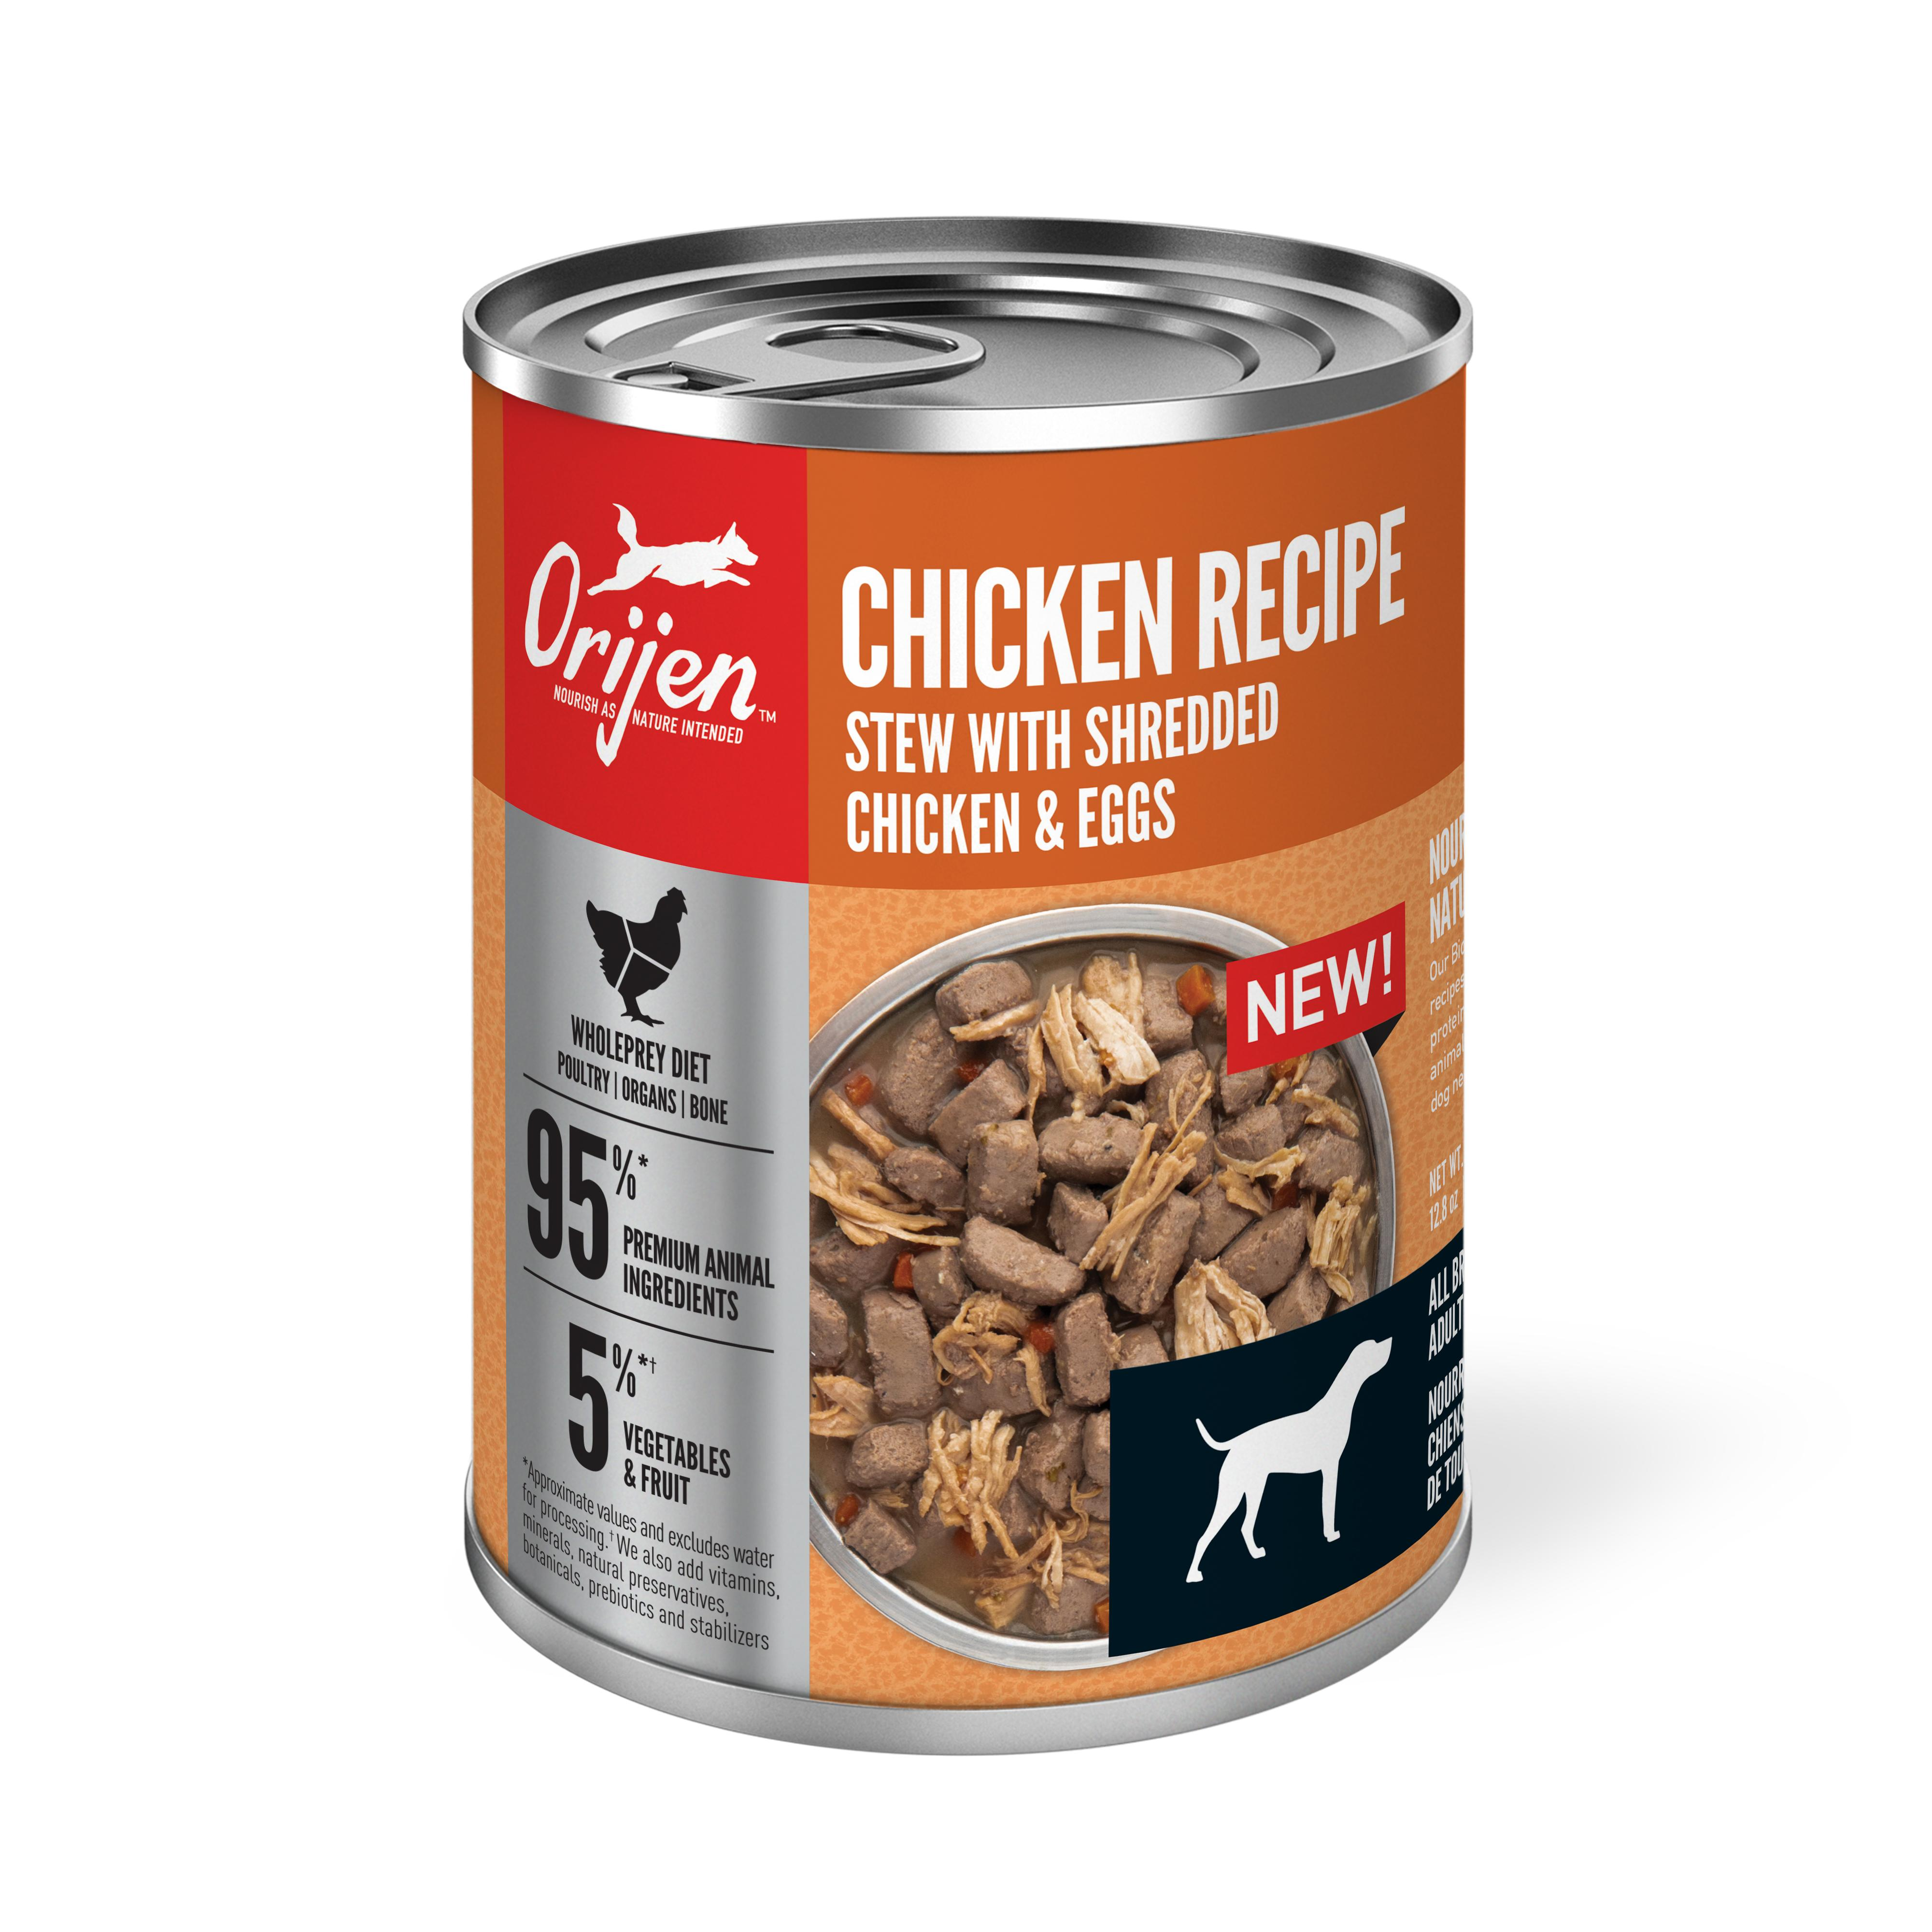 ORIJEN Chicken Stew with Shredded Chicken & Eggs Wet Dog Food Image